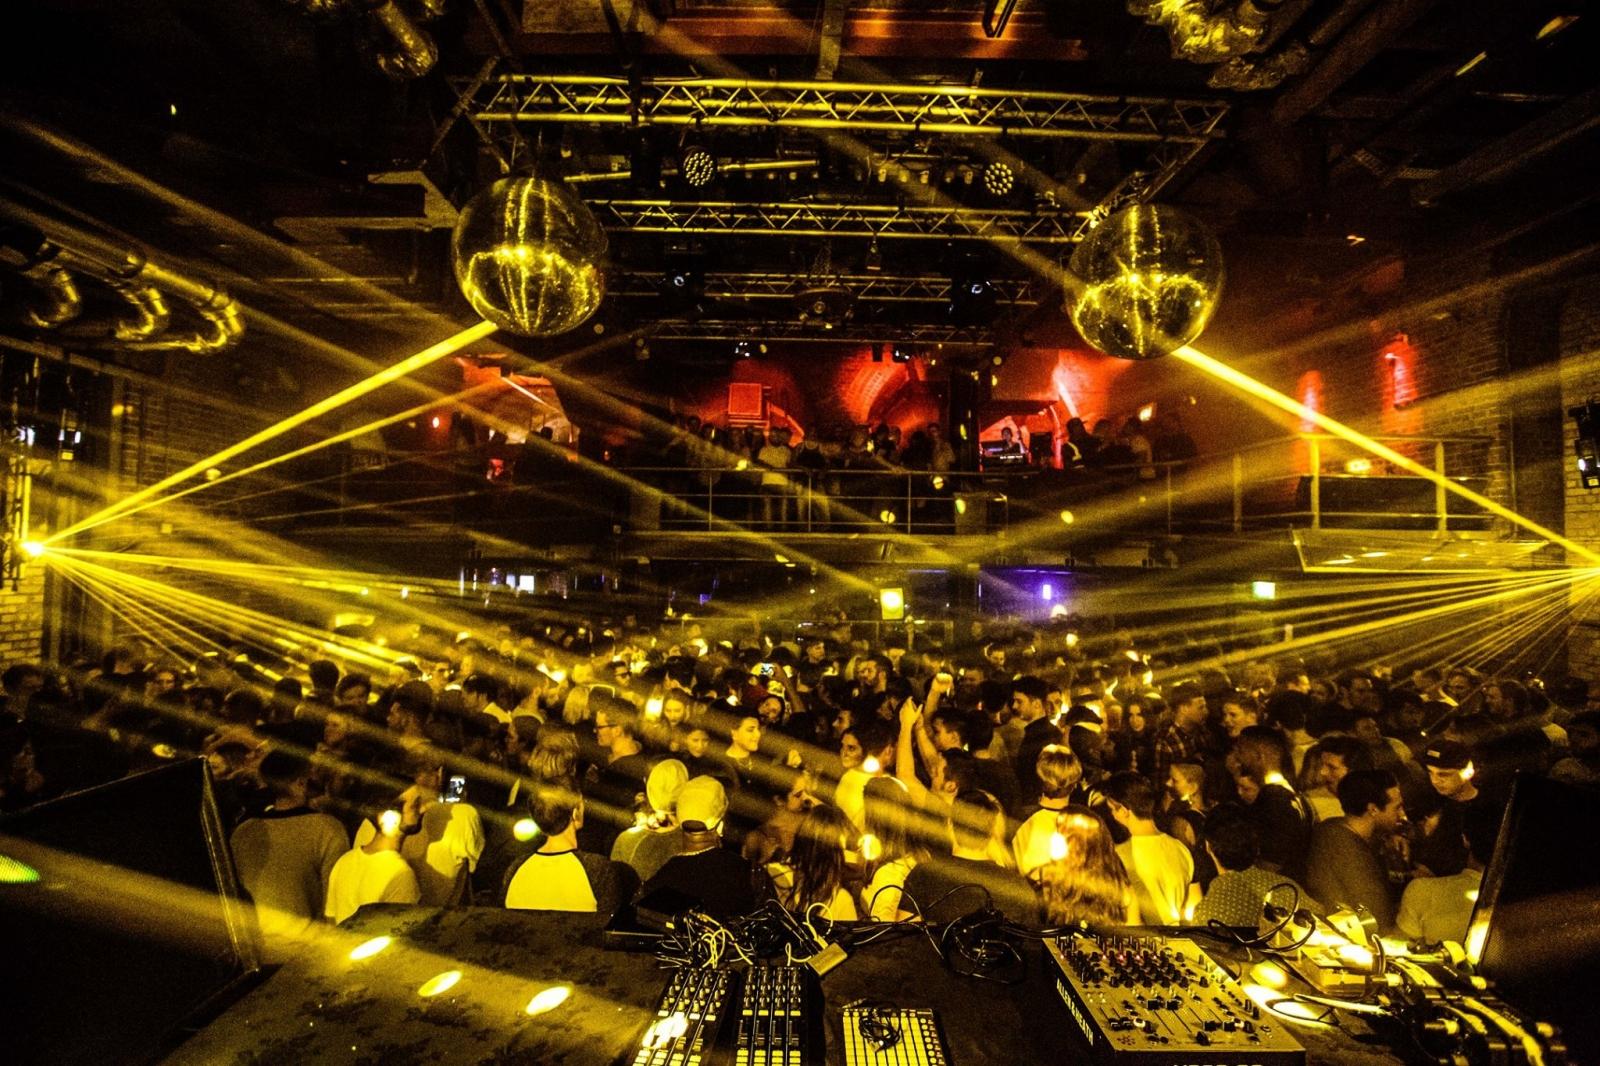 Fabric nightclub in London: Authorities revoke licence of ...